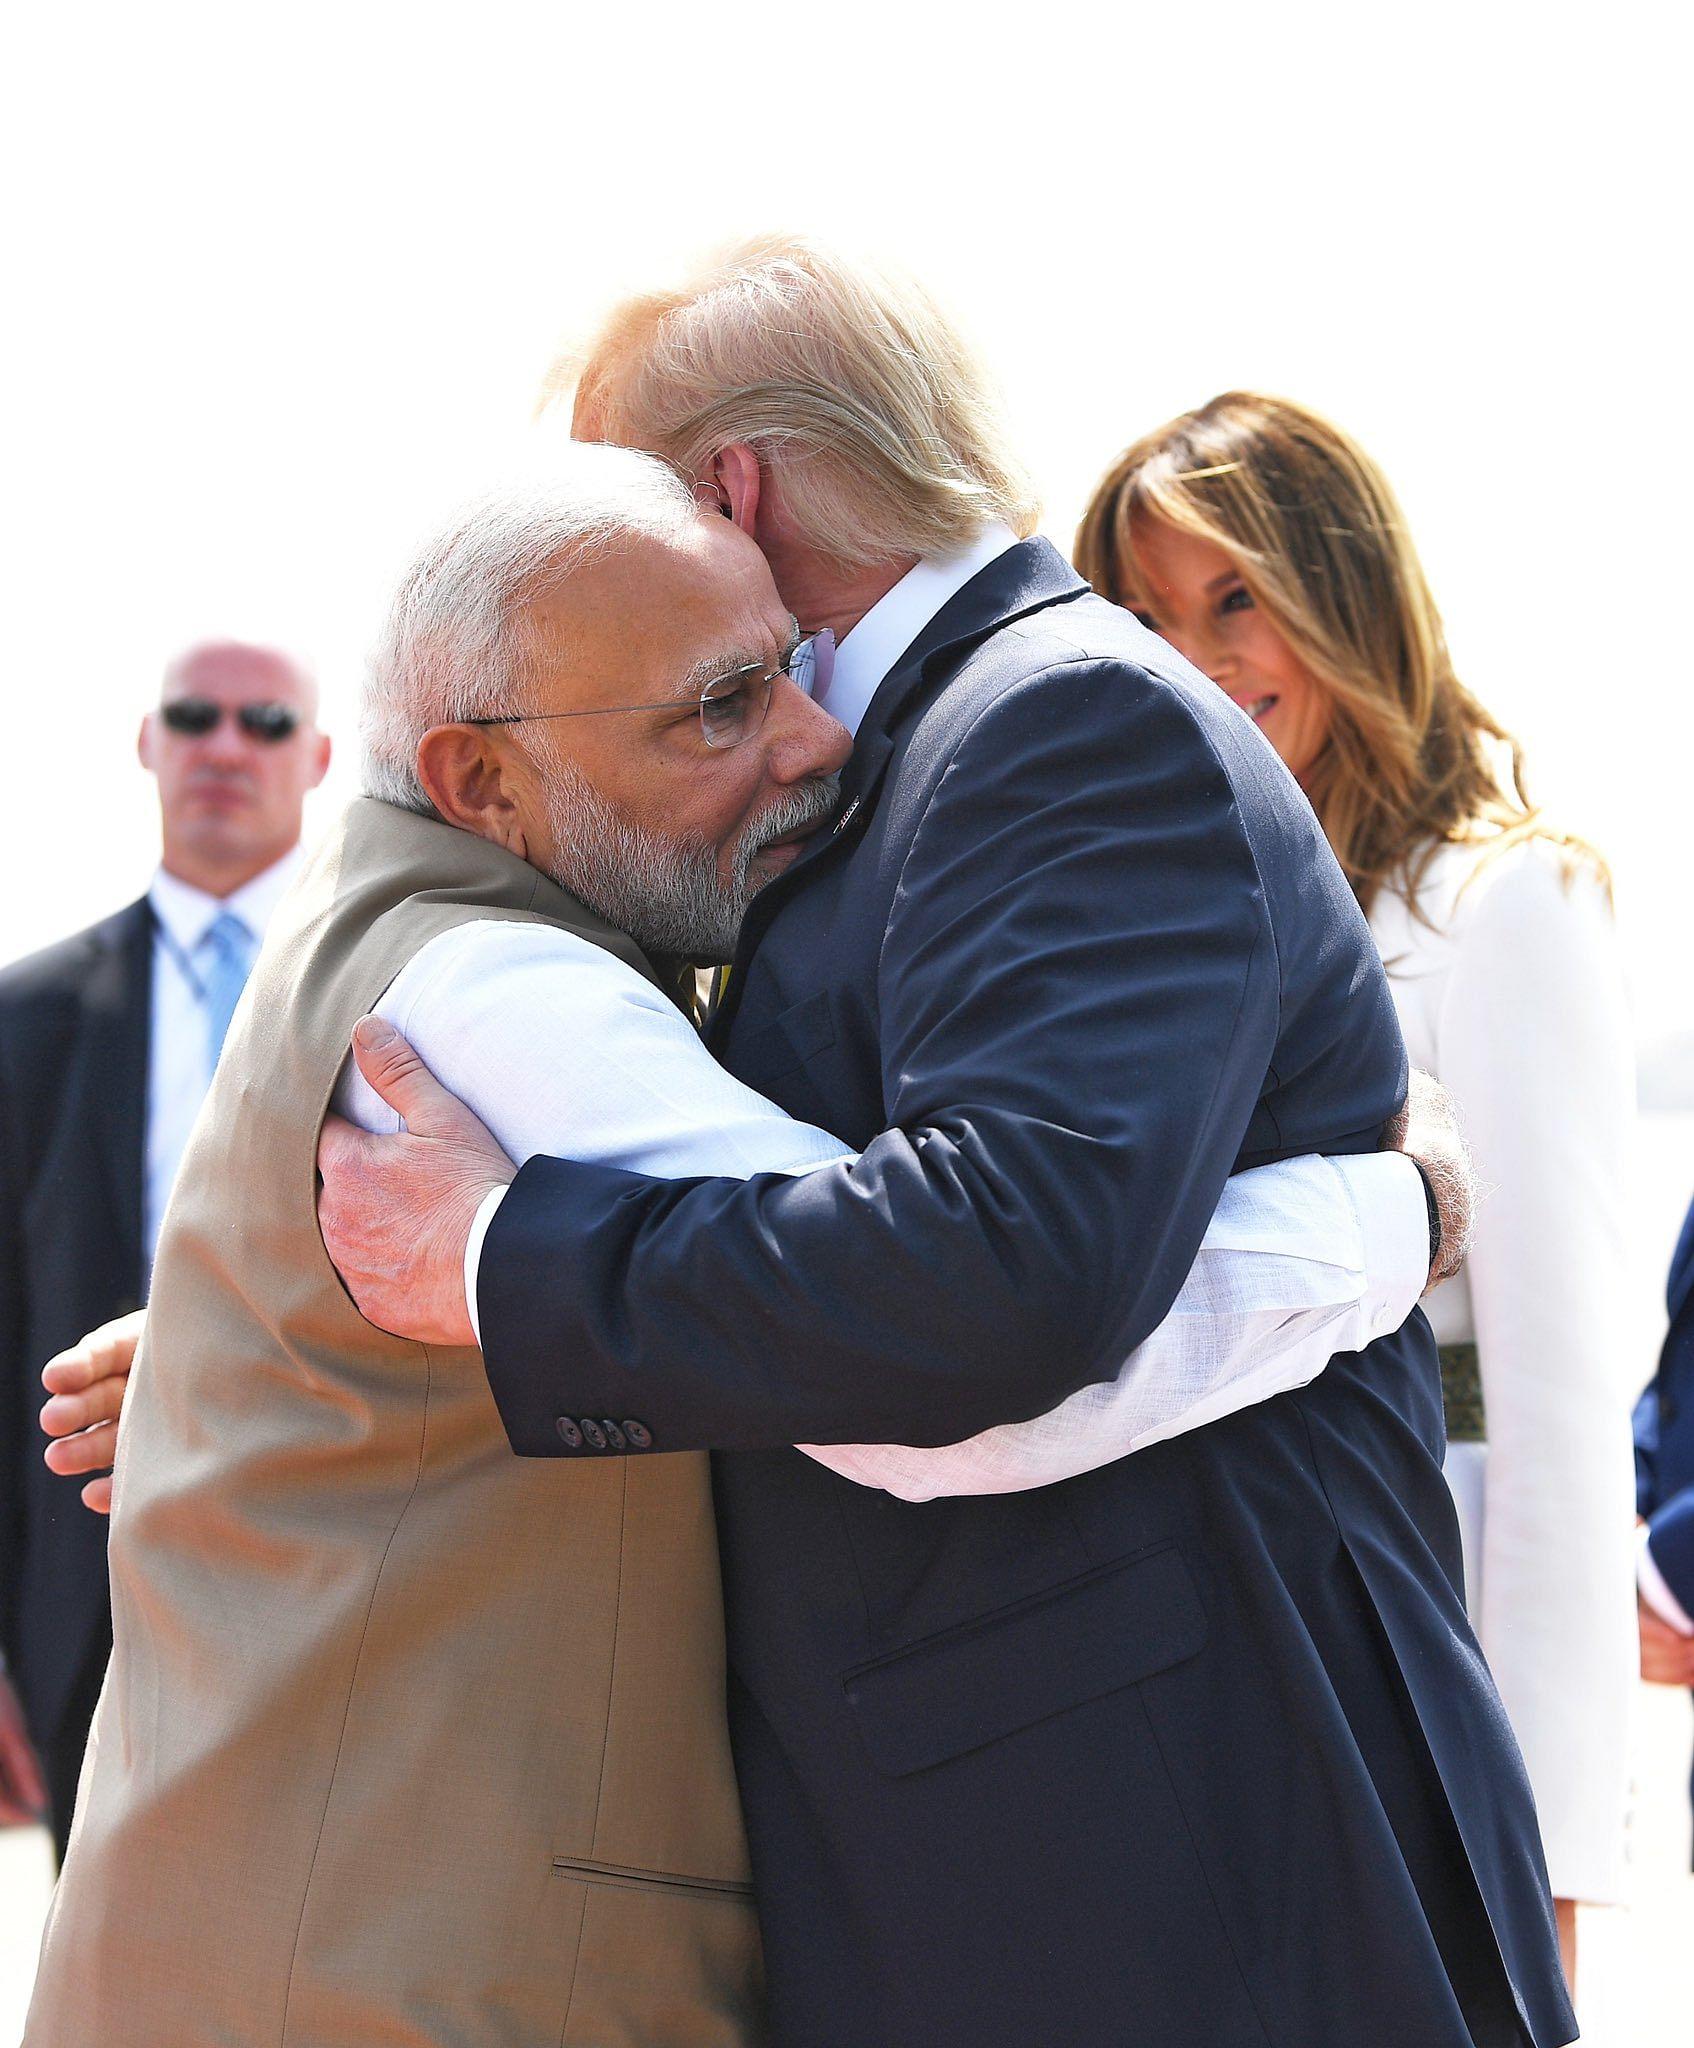 PM Narendra Modi hugs Donald Trump at Ahmedabad airport | Photo: @narendramodi | Twitter